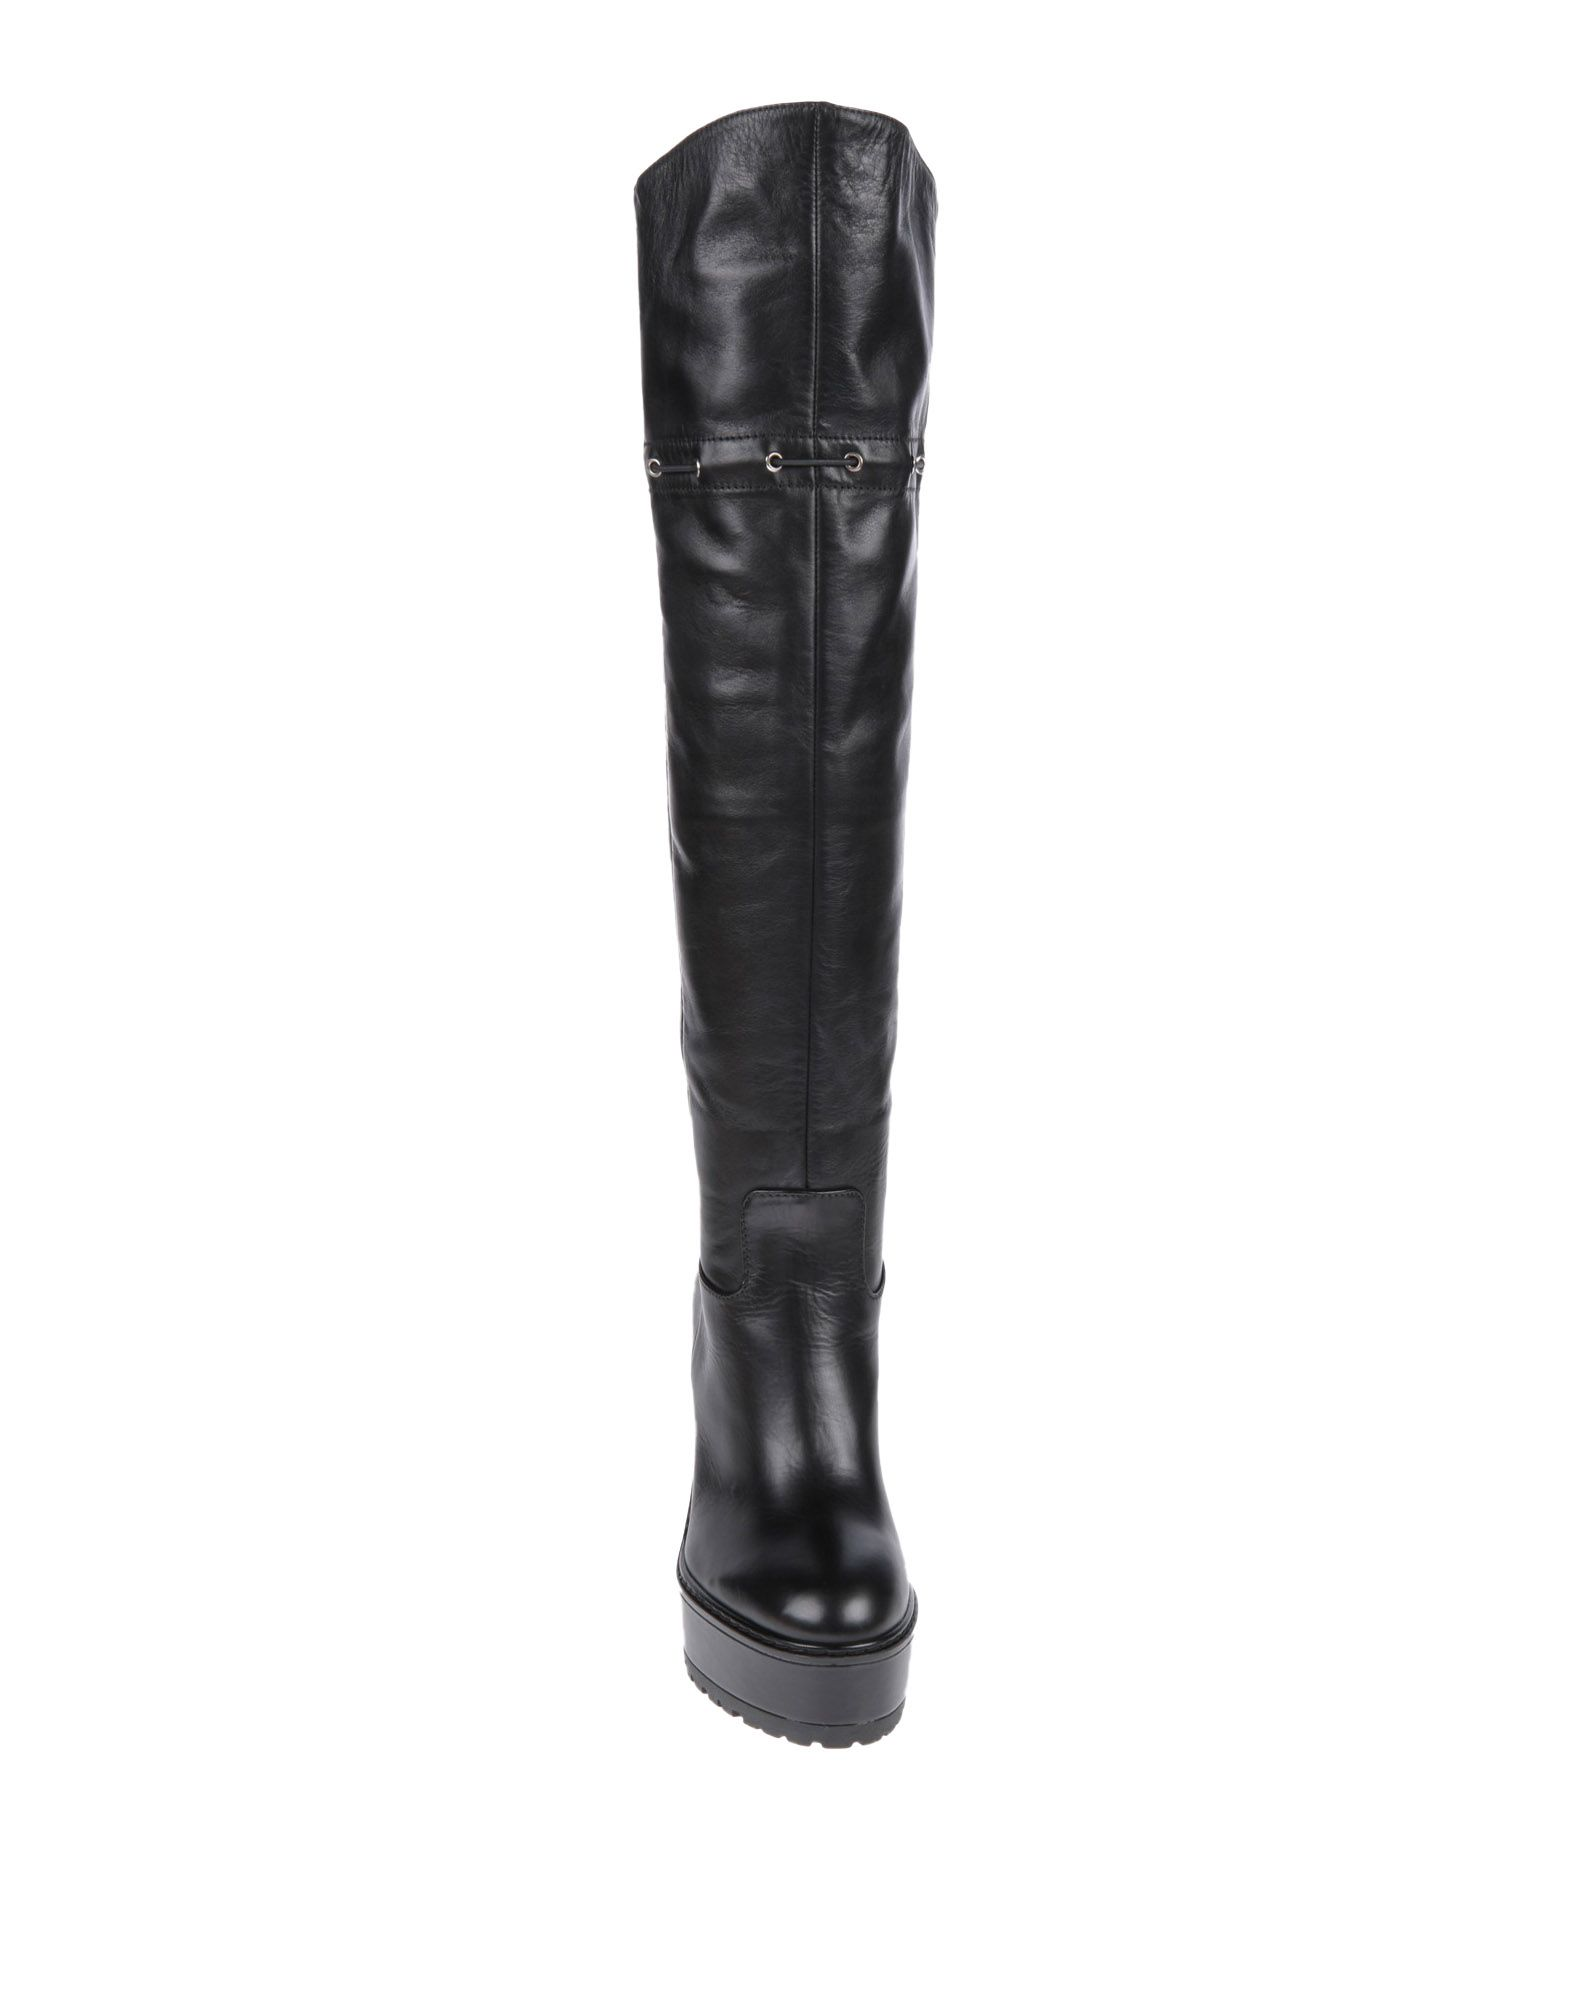 Stilvolle billige Stiefel Schuhe Janet Sport Stiefel billige Damen  11527794FO 260be3